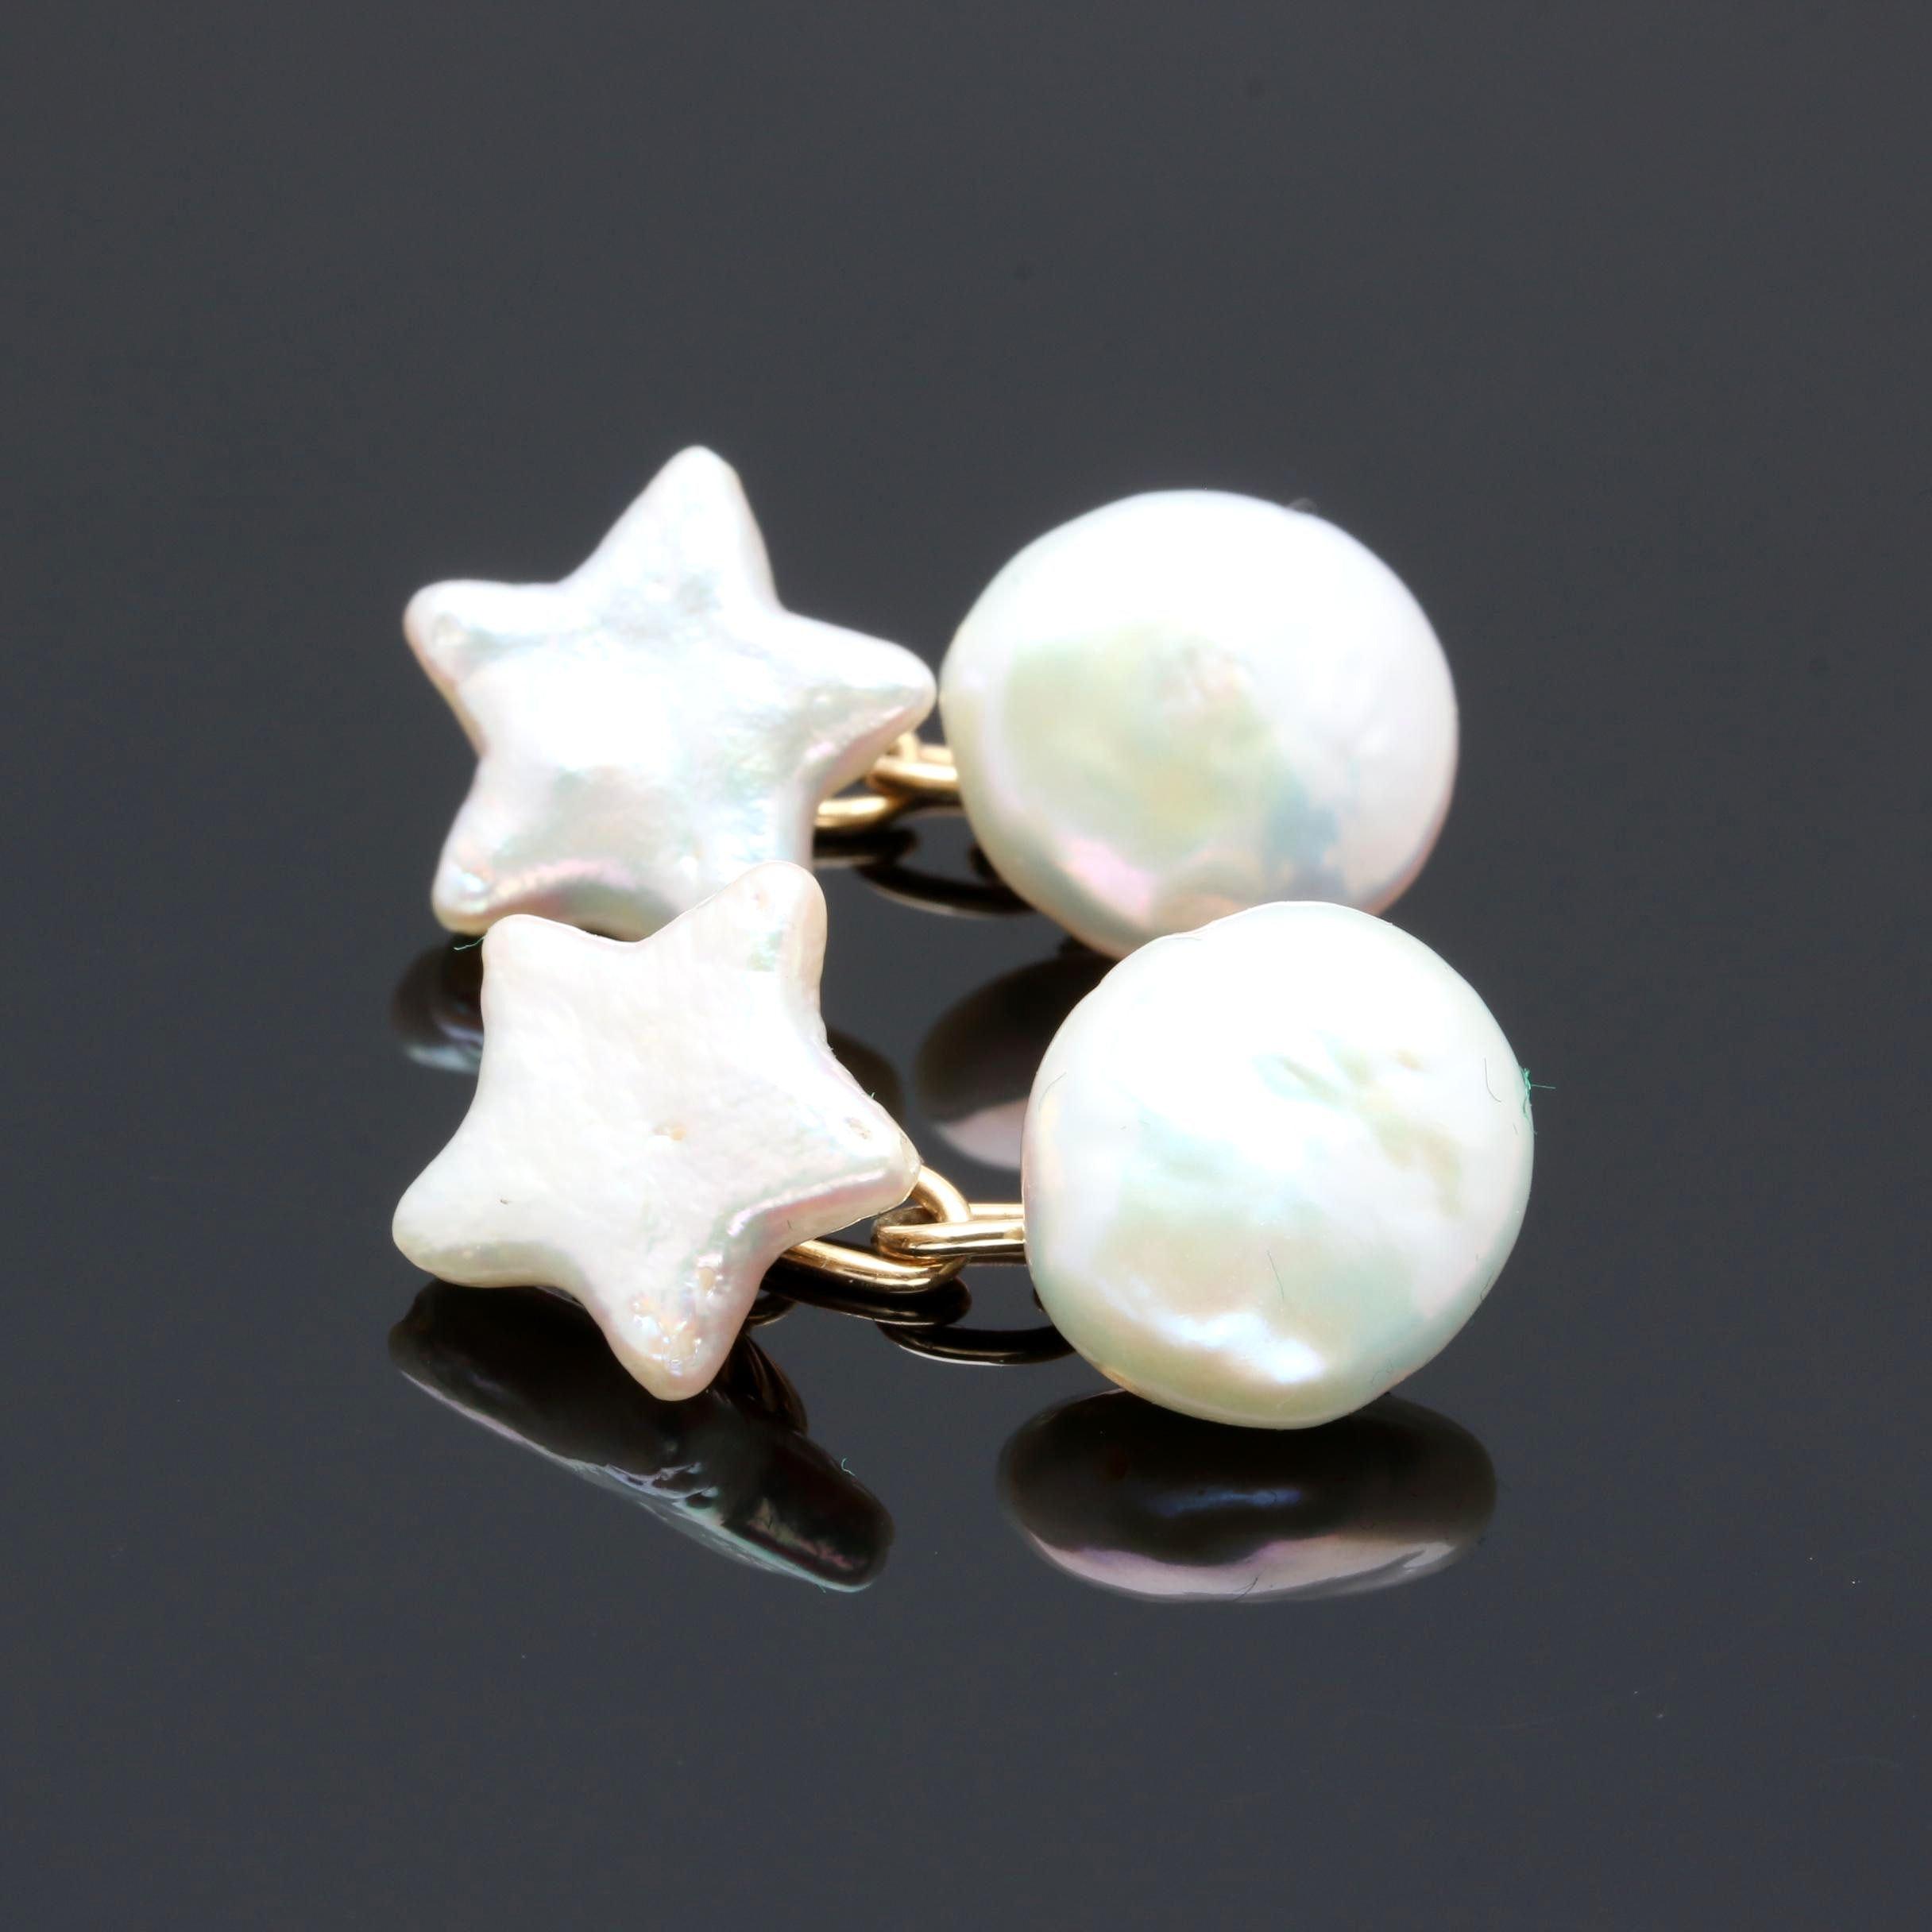 14K Yellow Gold Cultured Pearl Cufflinks